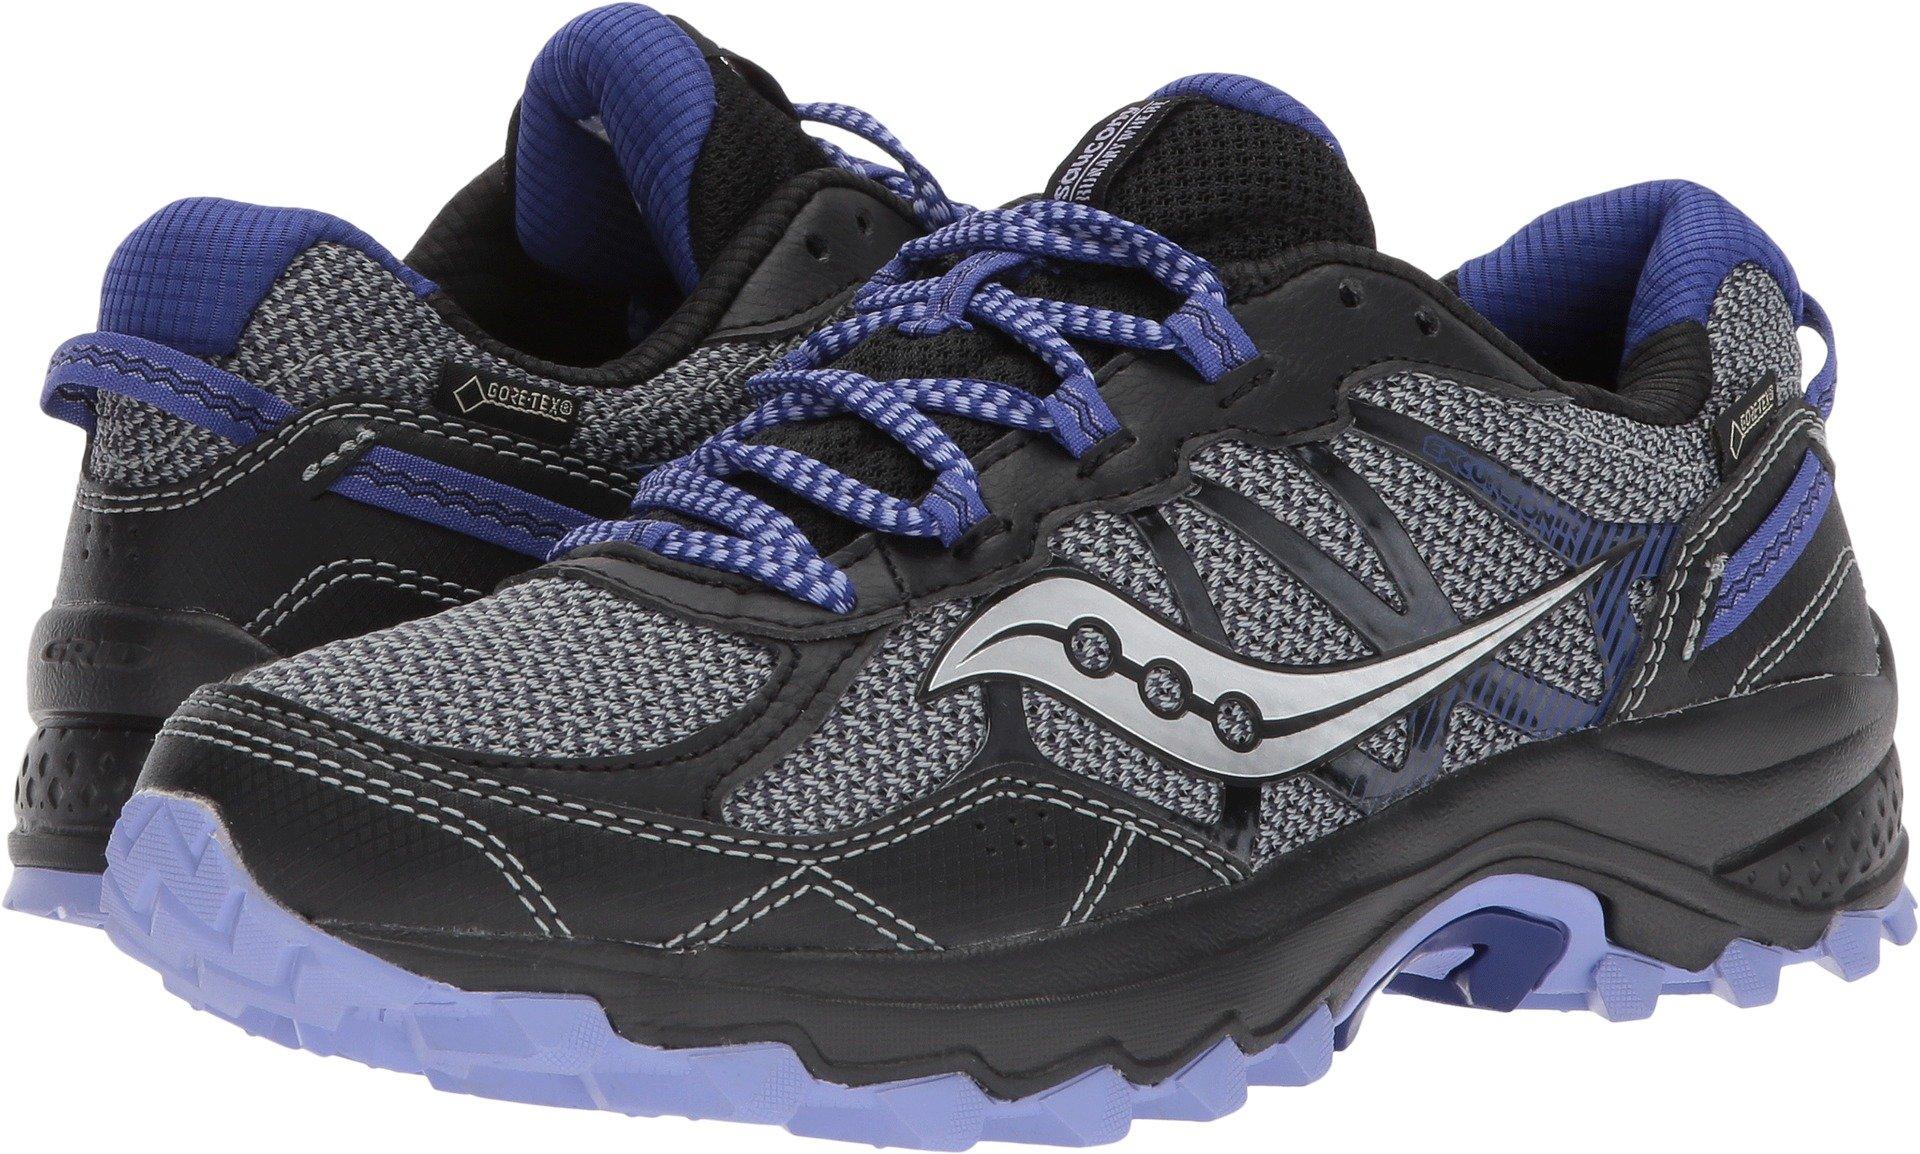 Saucony Women's Excursion TR11 GTX Running Shoe, Grey Purple, 6 Medium US